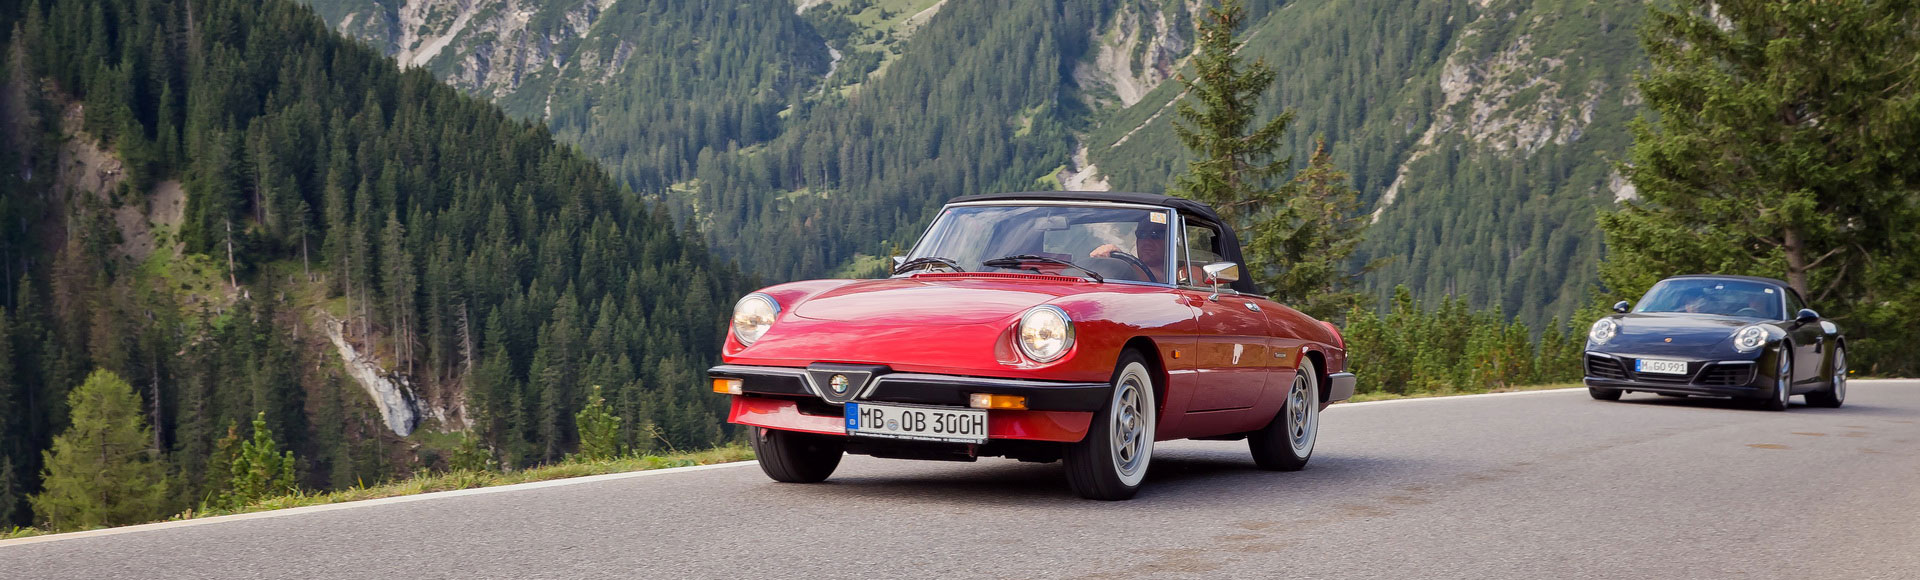 Alfa Romeo Spider 0155 Sommer